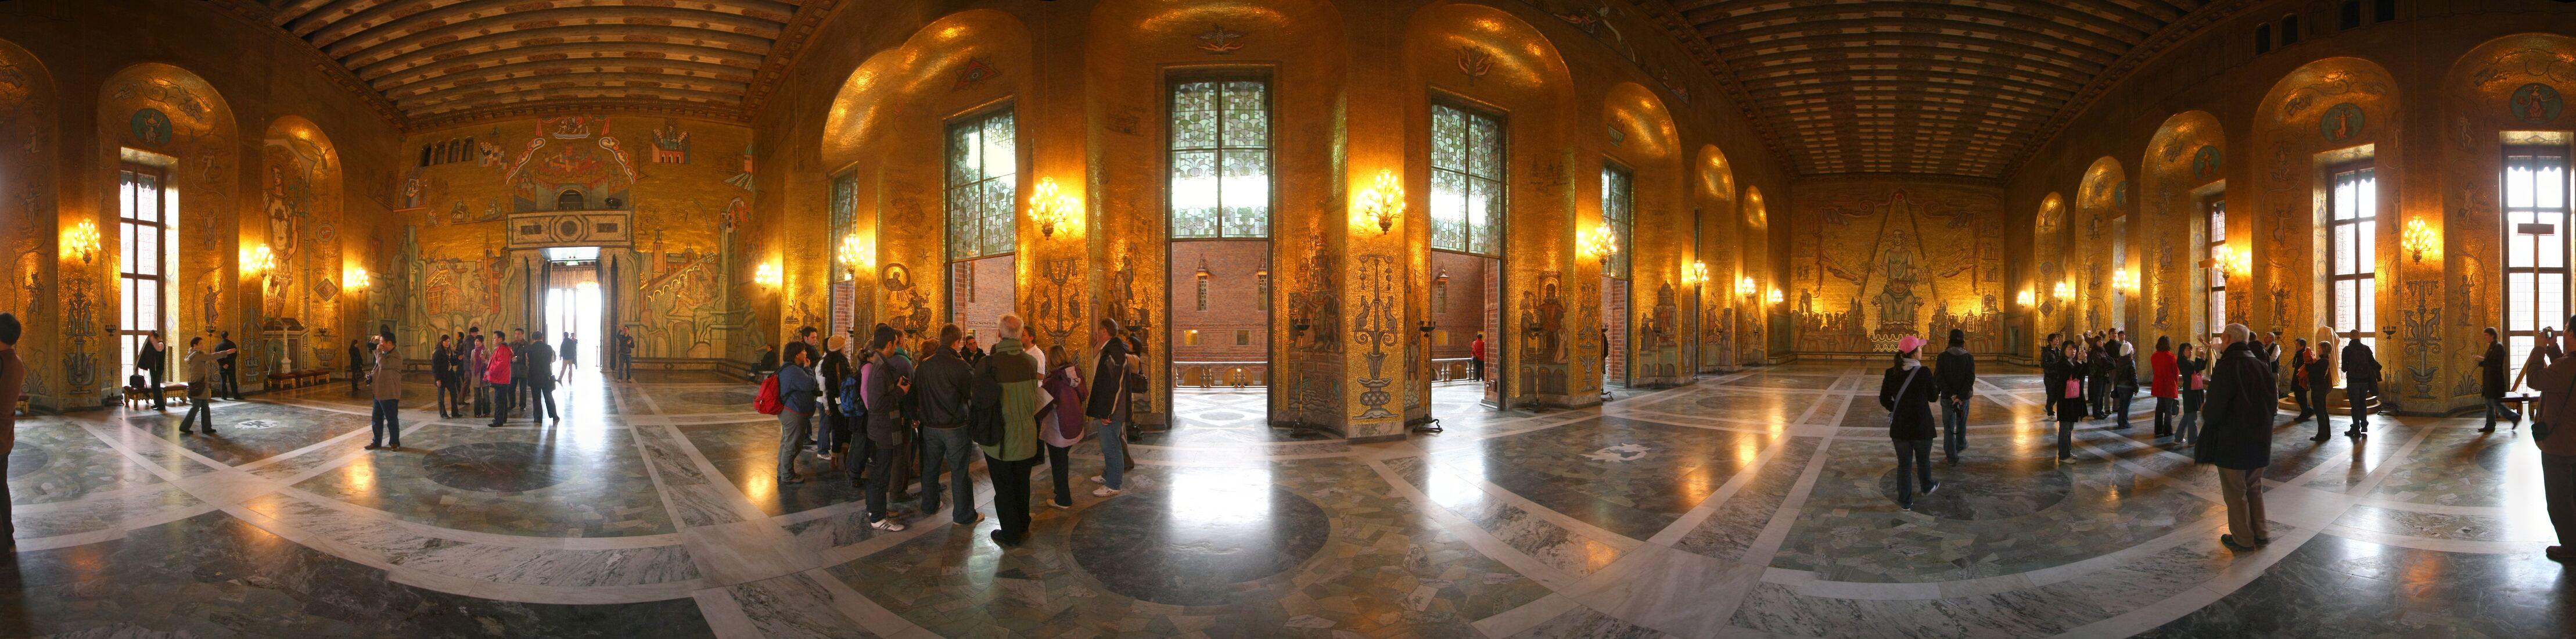 http://pic.templetons.com/brad/pano/baltic/stock-cityhall-gold.jpg